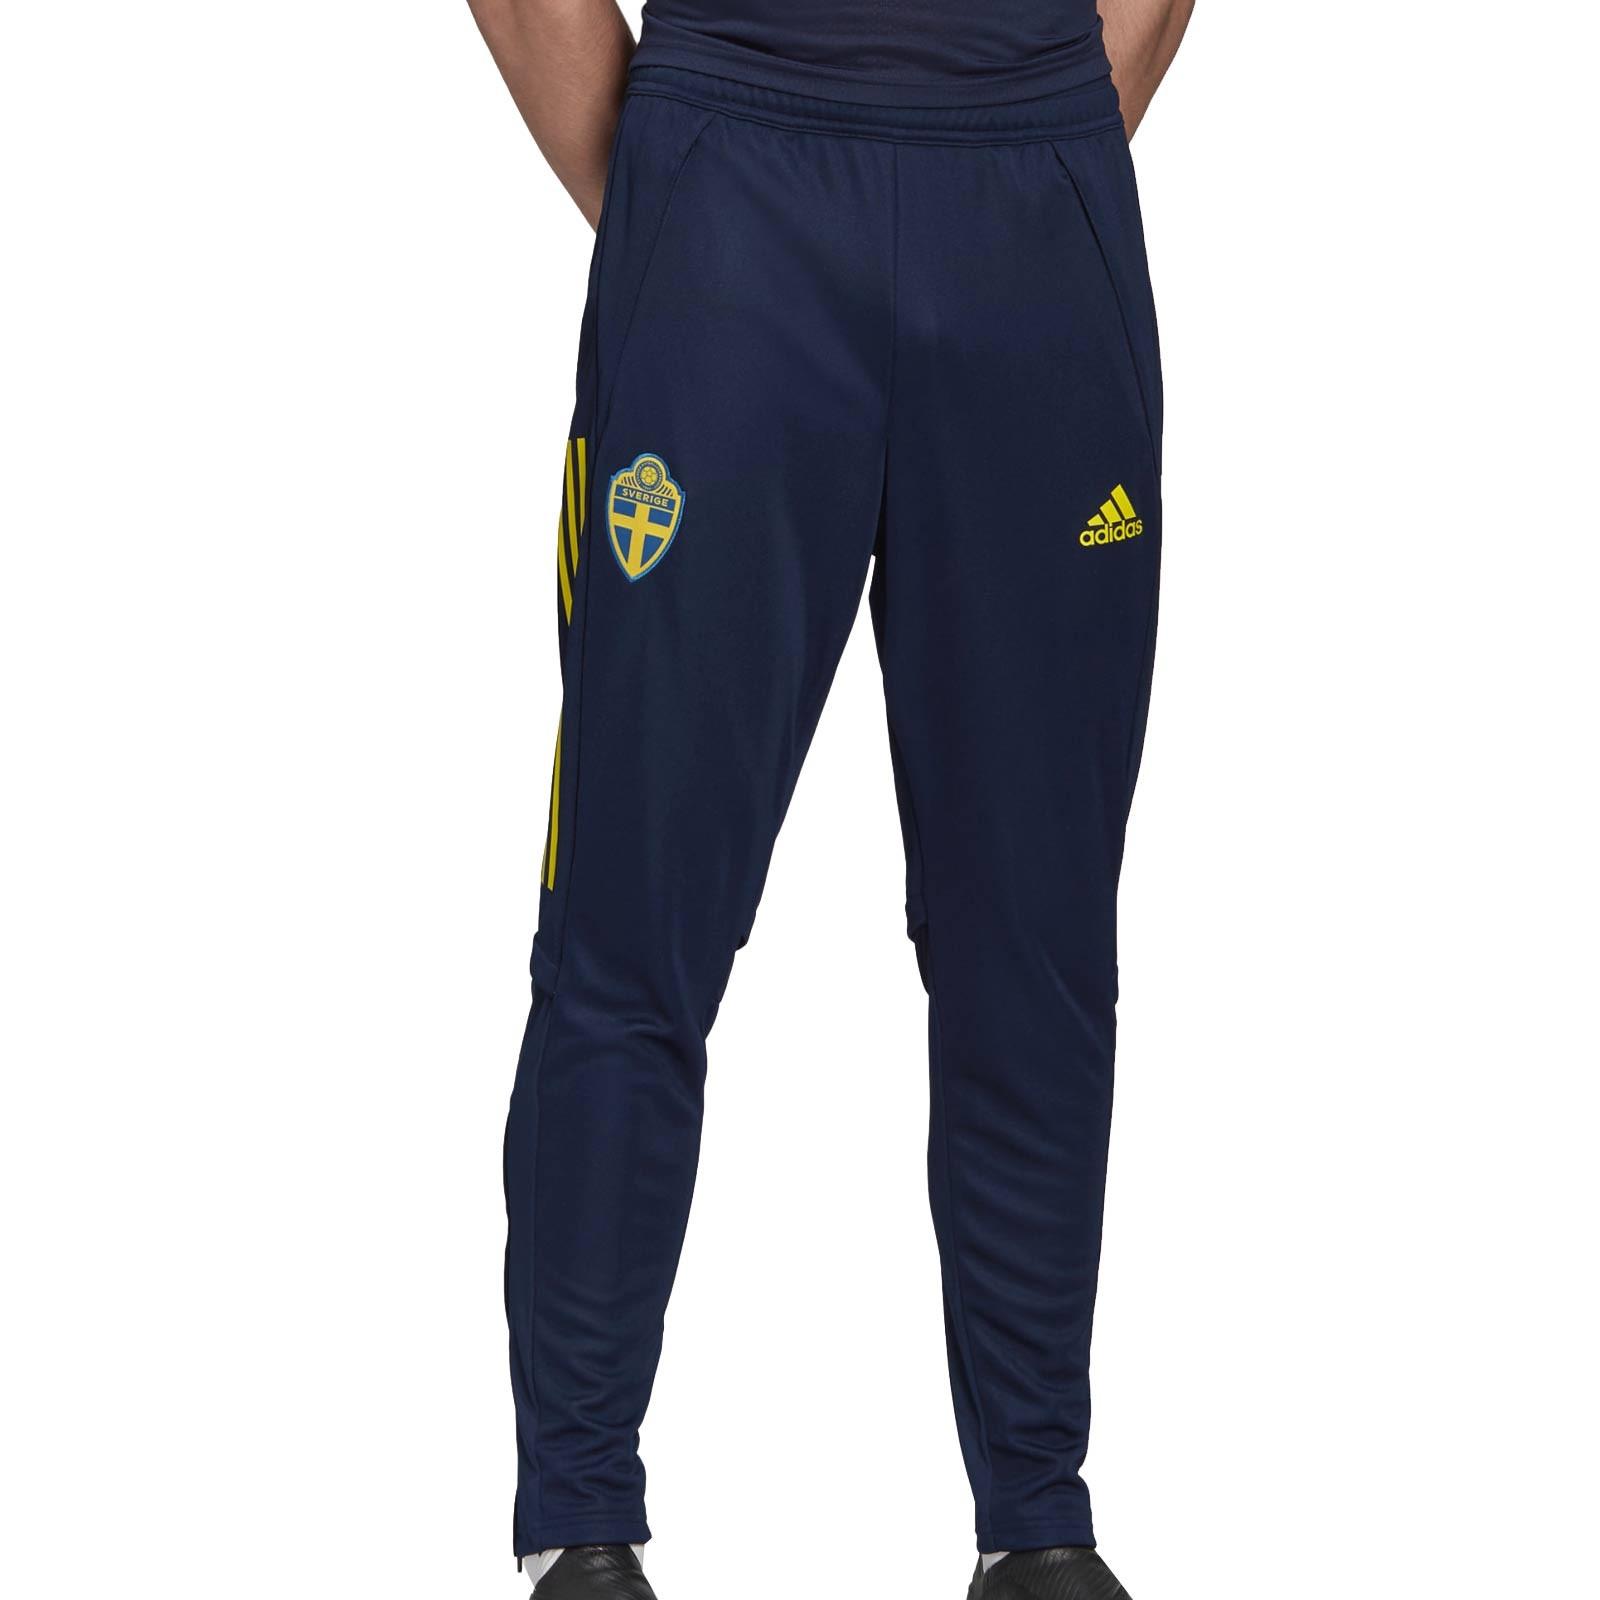 Camiseta entreno adidas Suecia 19 20 marino | futbolmania